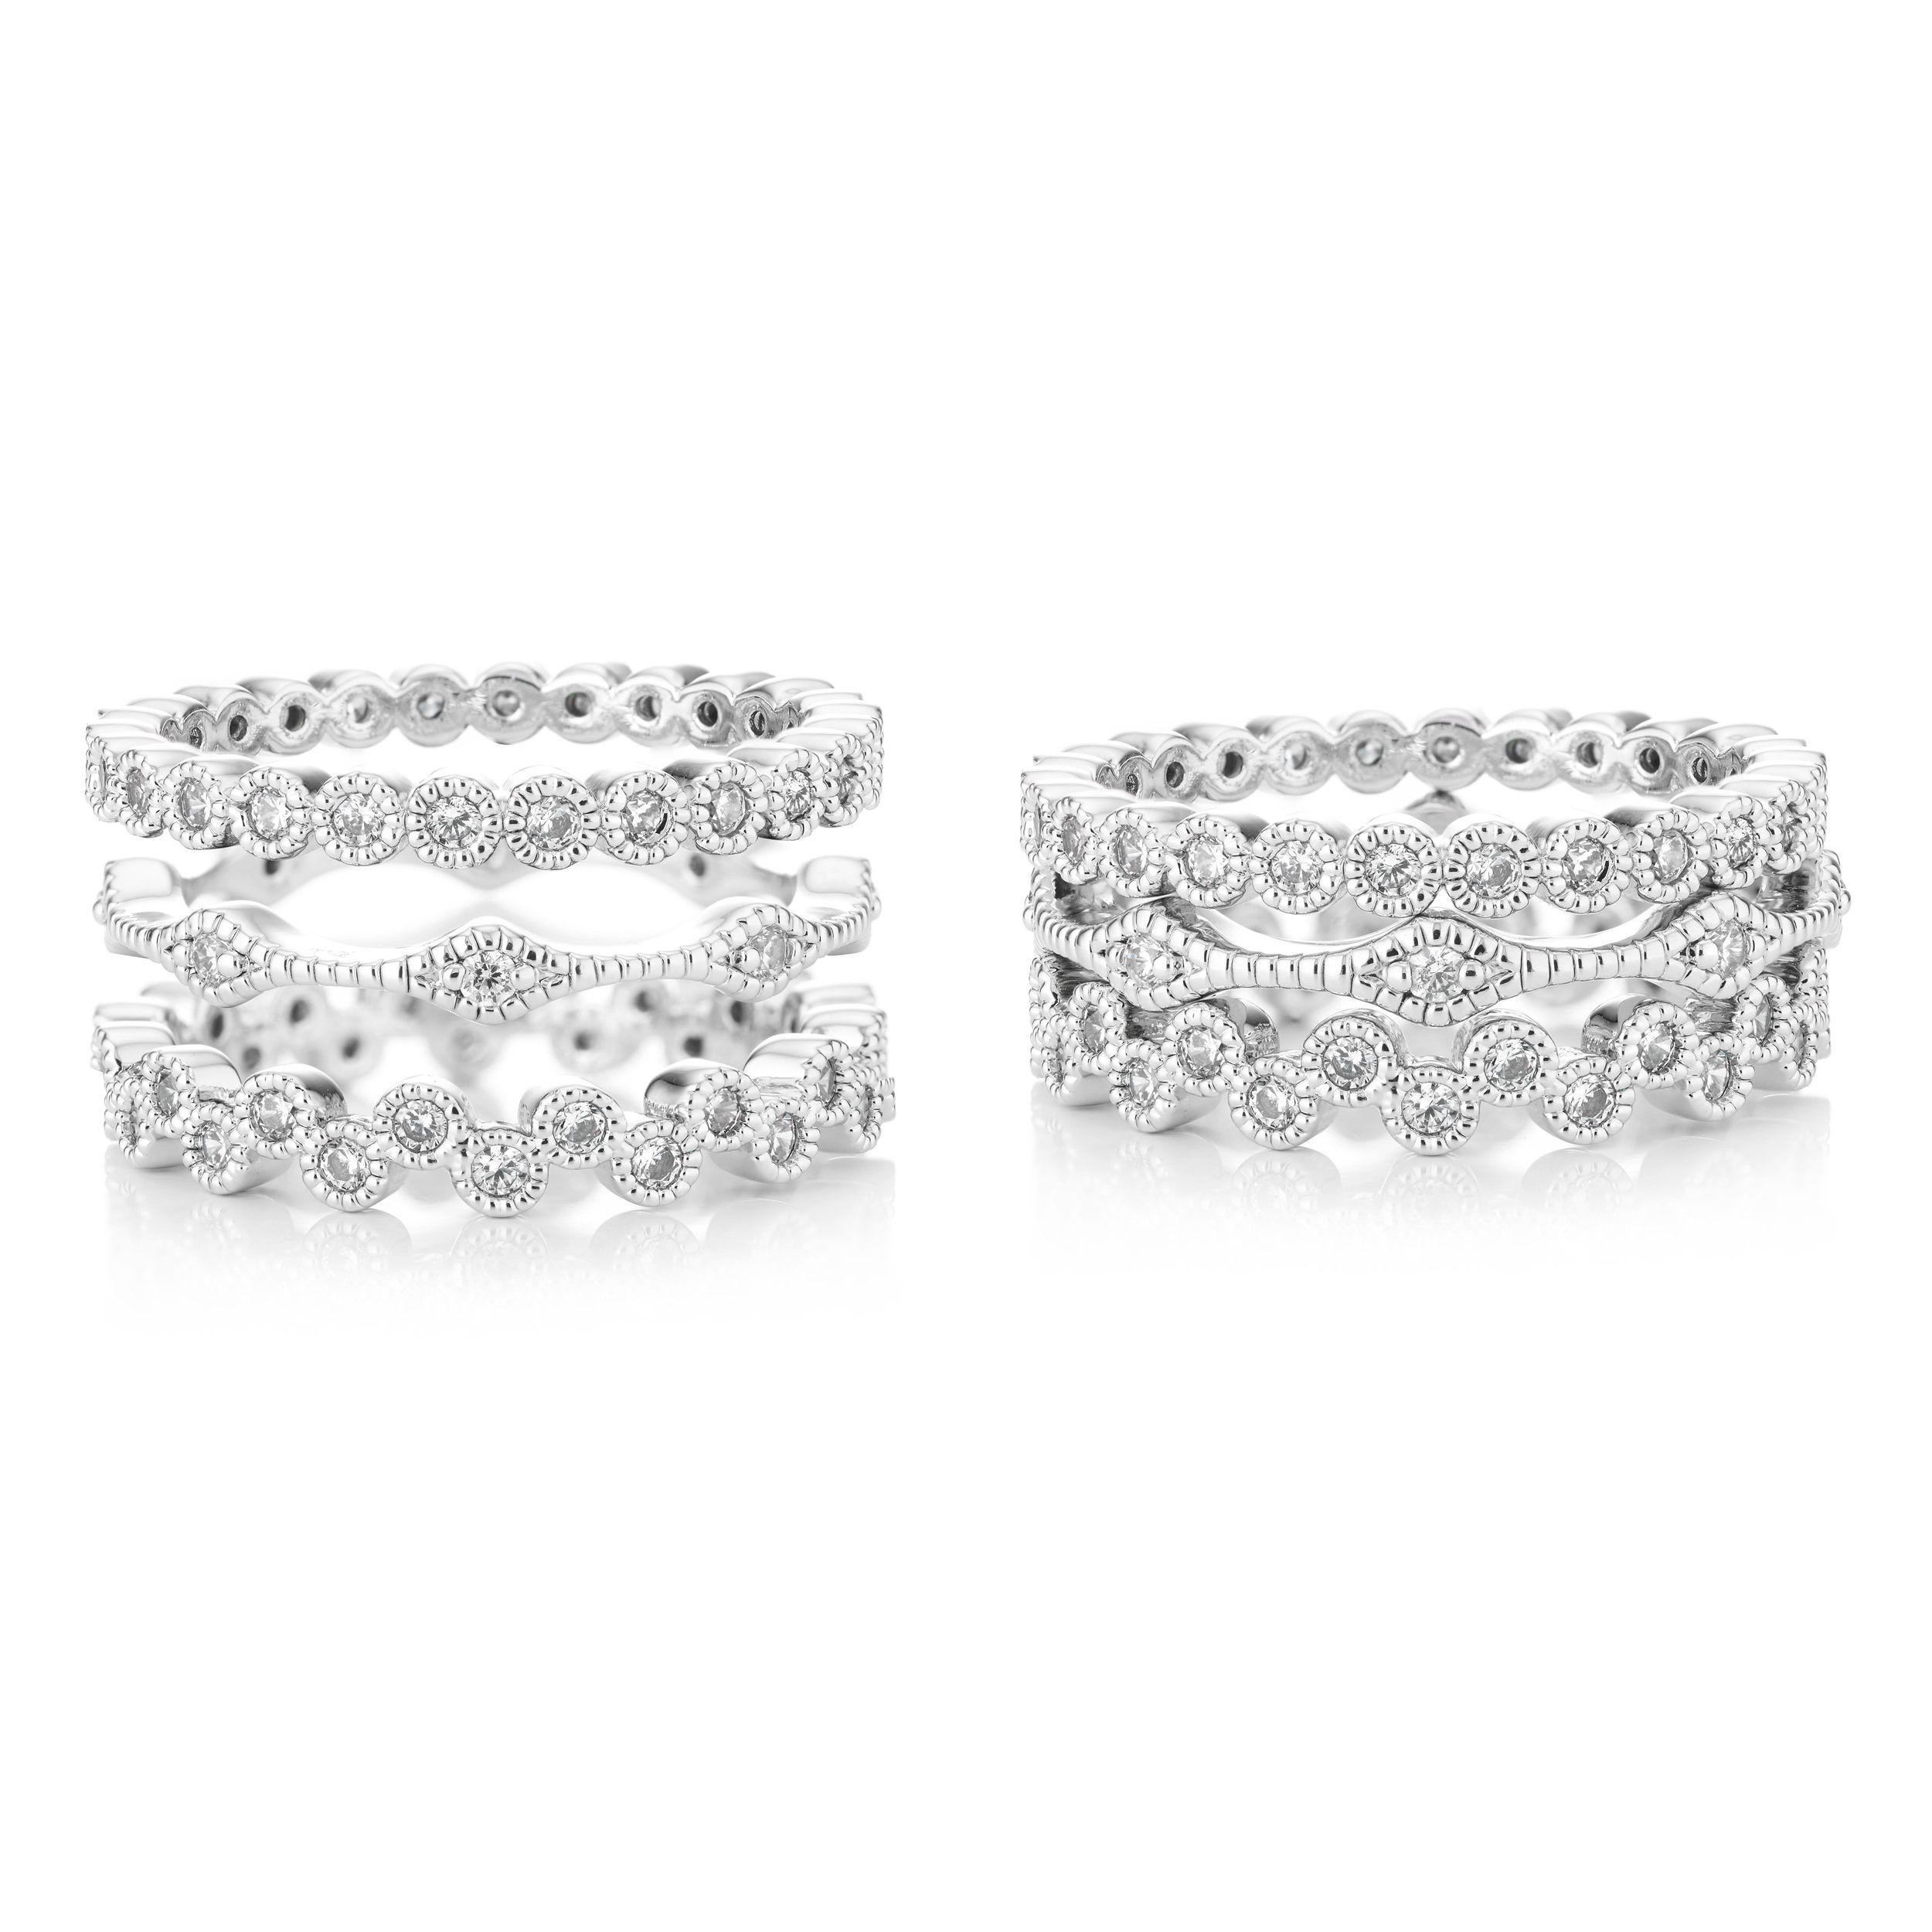 Buckley London Crystal Triple Stacker Rings